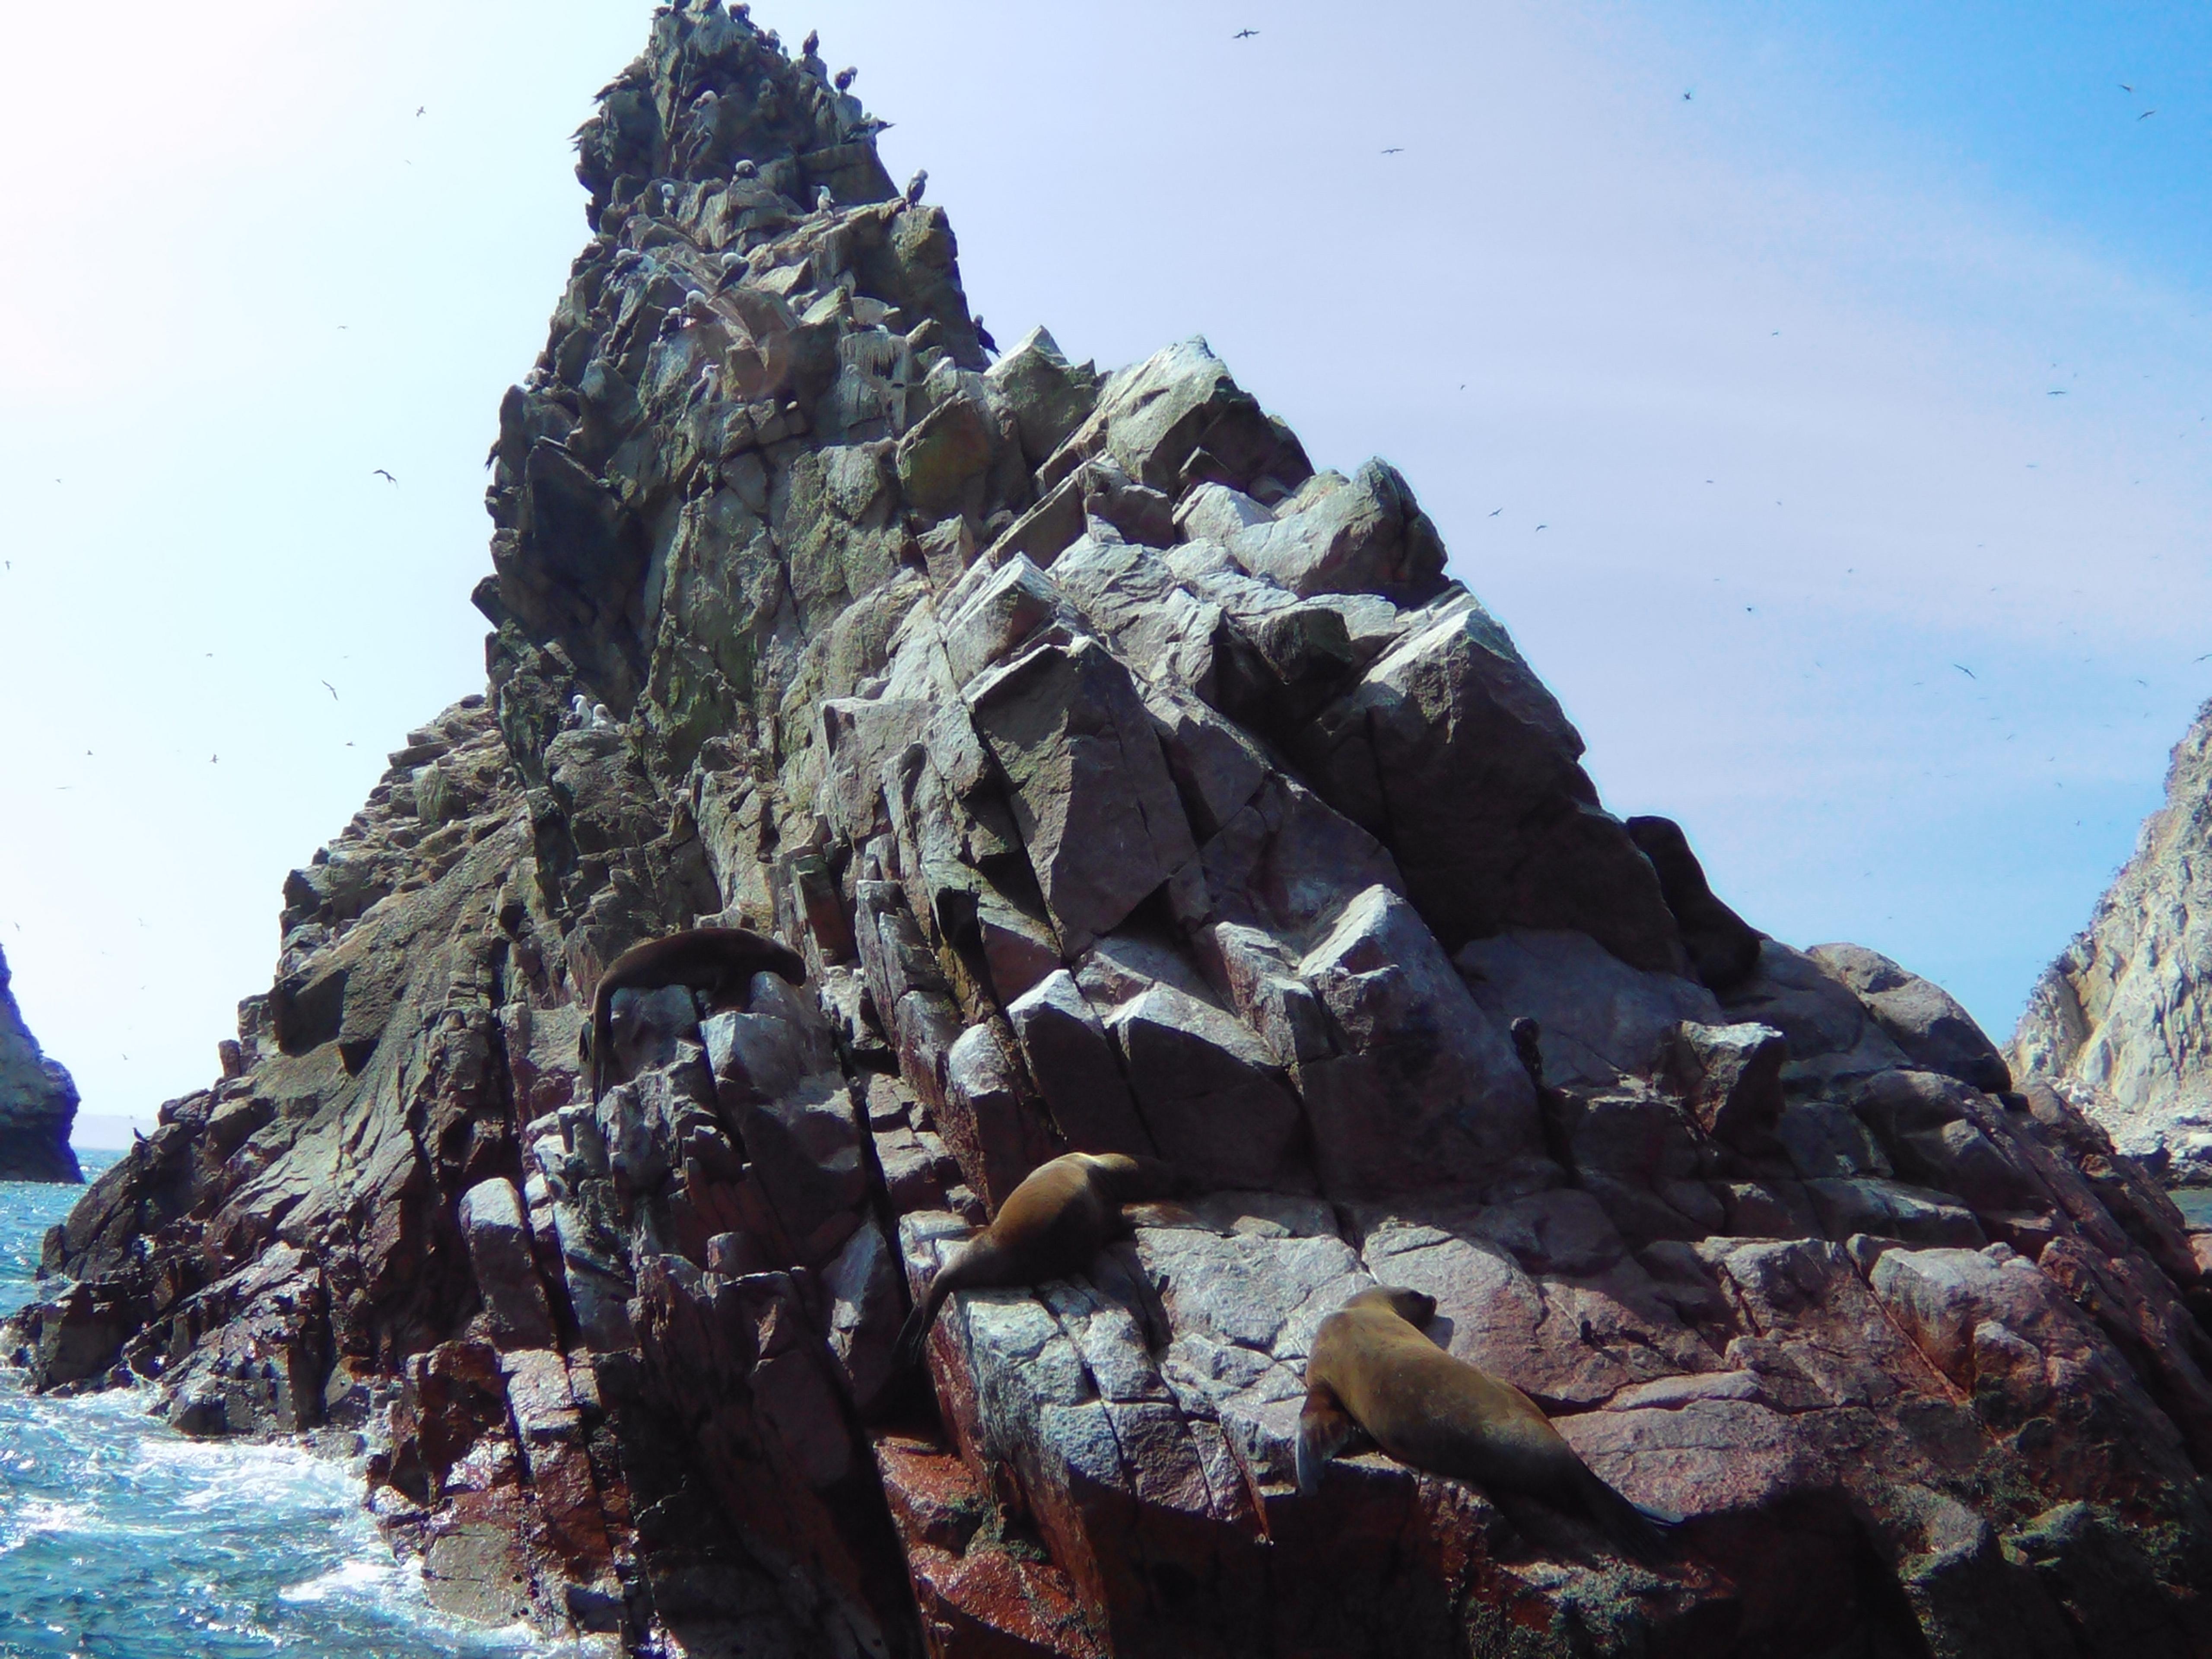 Sea lions sun bathing on the rocks in the Ballestas Islands